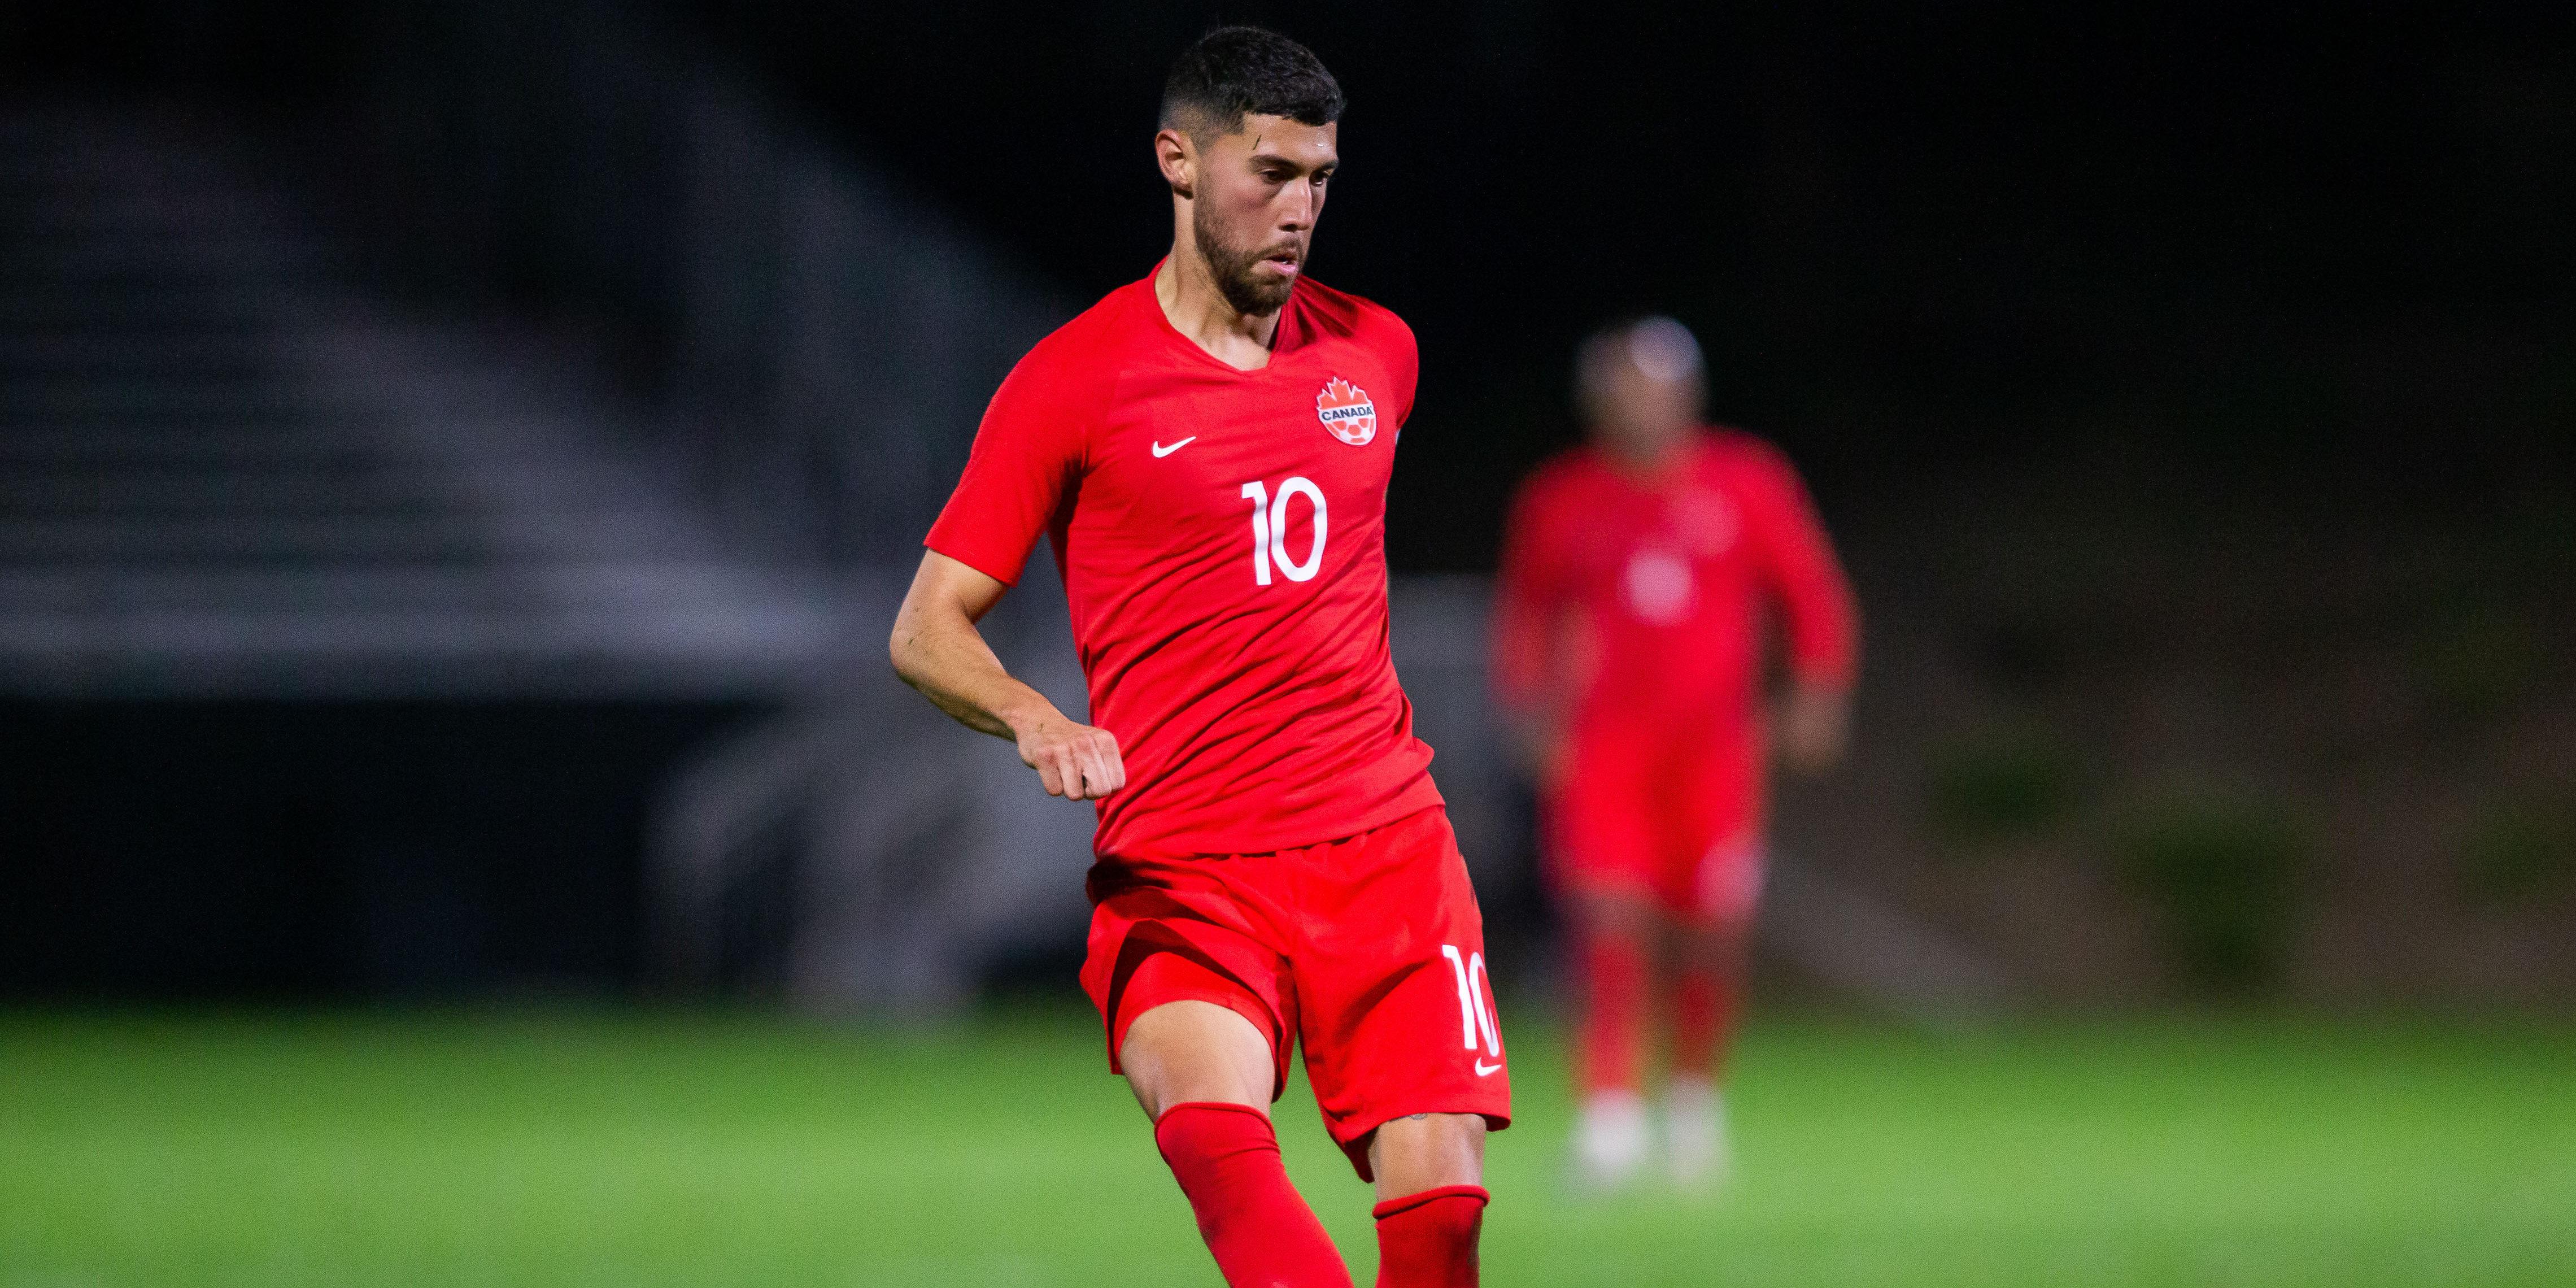 Men's International Friendly 10 January 2020 - Irvine, CA, USA Canada Soccer by Liza Rosales Jonathan Osorio